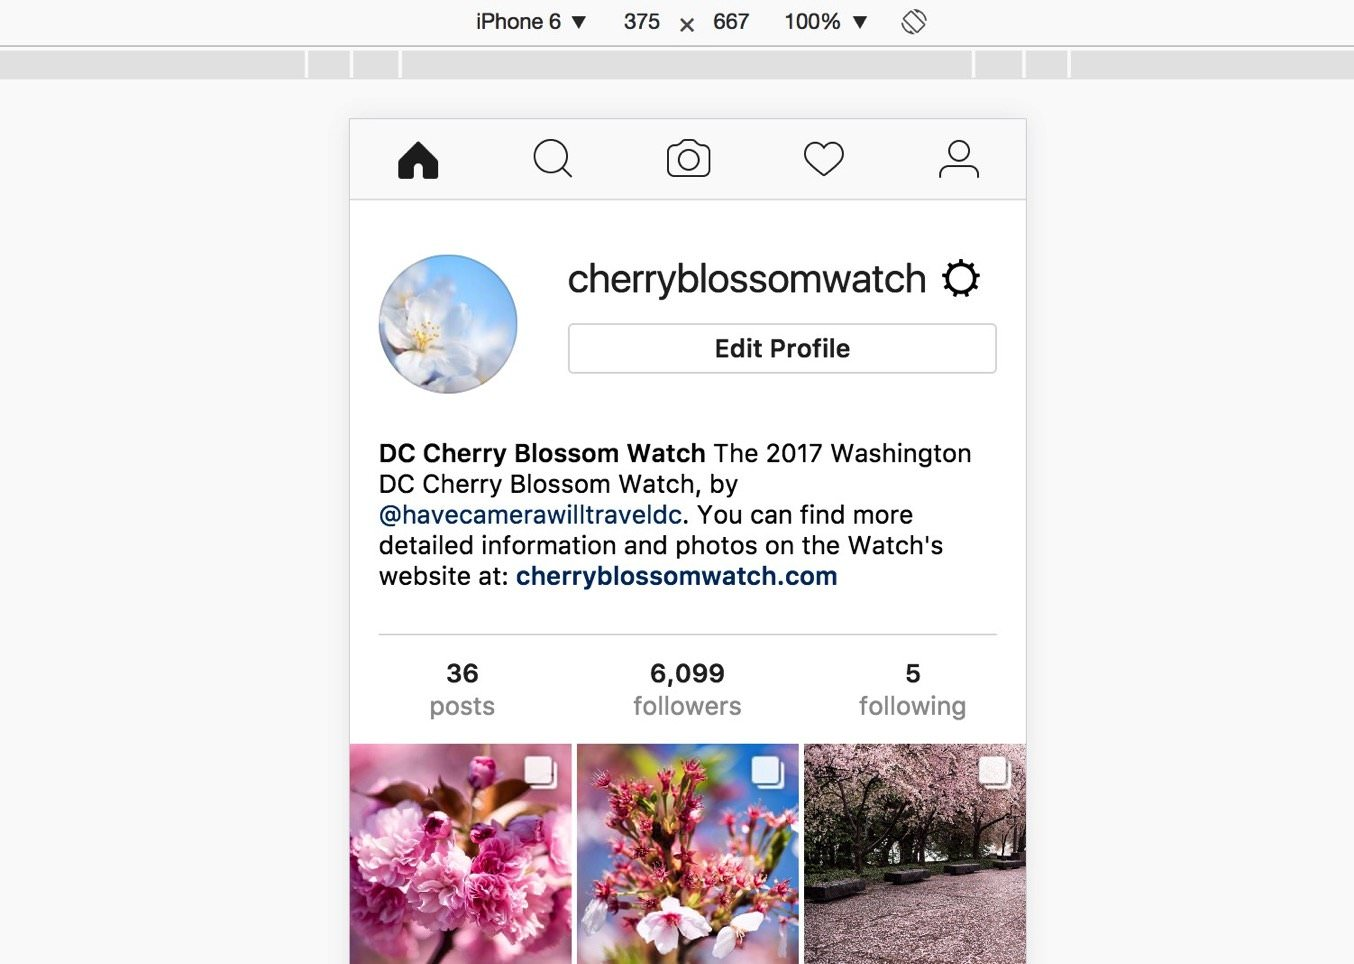 upload foto di Instagram lewat PC